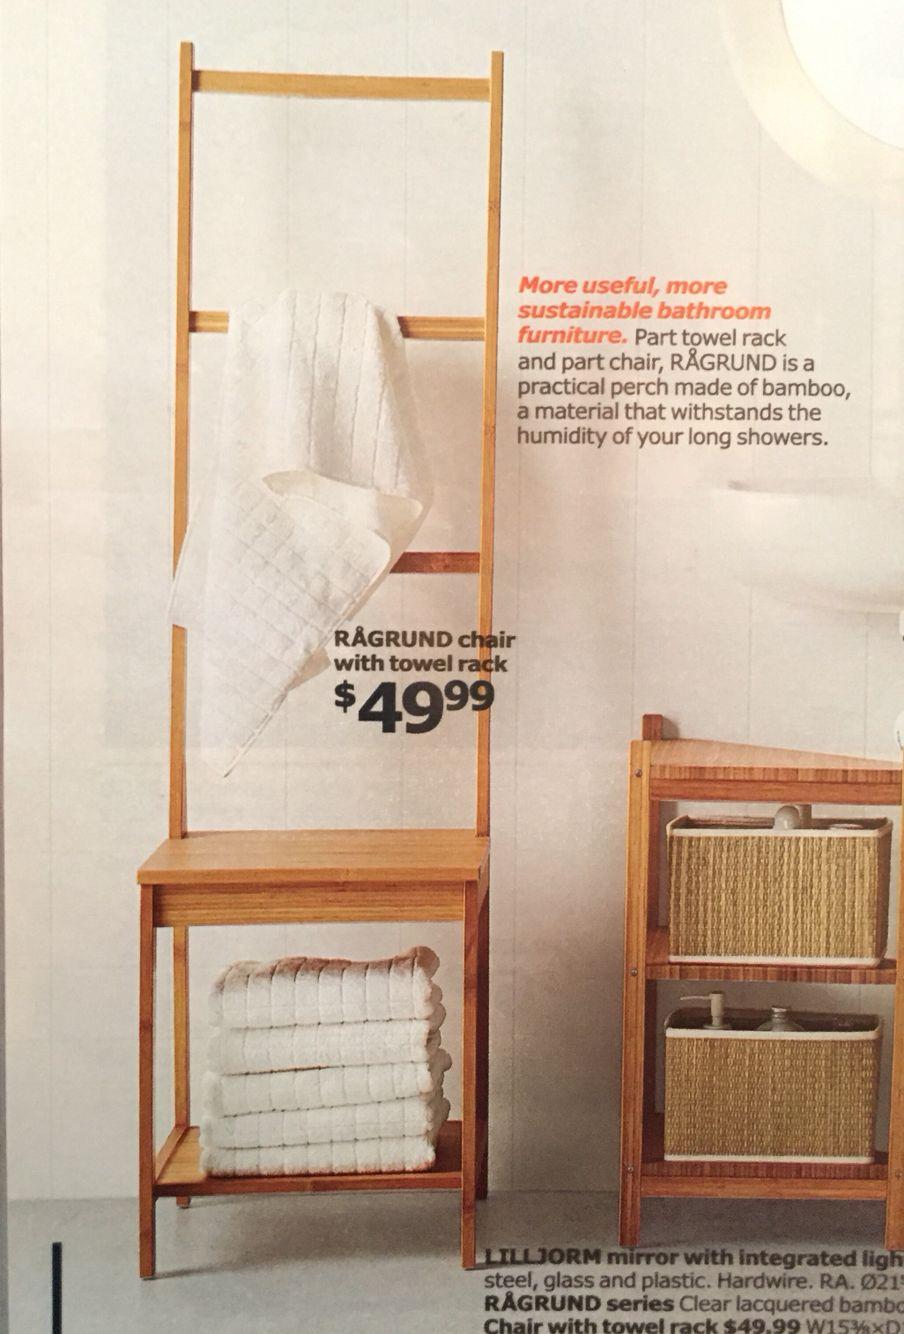 IKEA Ragrund Bathroom Chair with Towel Rack $9.9  Outdoor towel